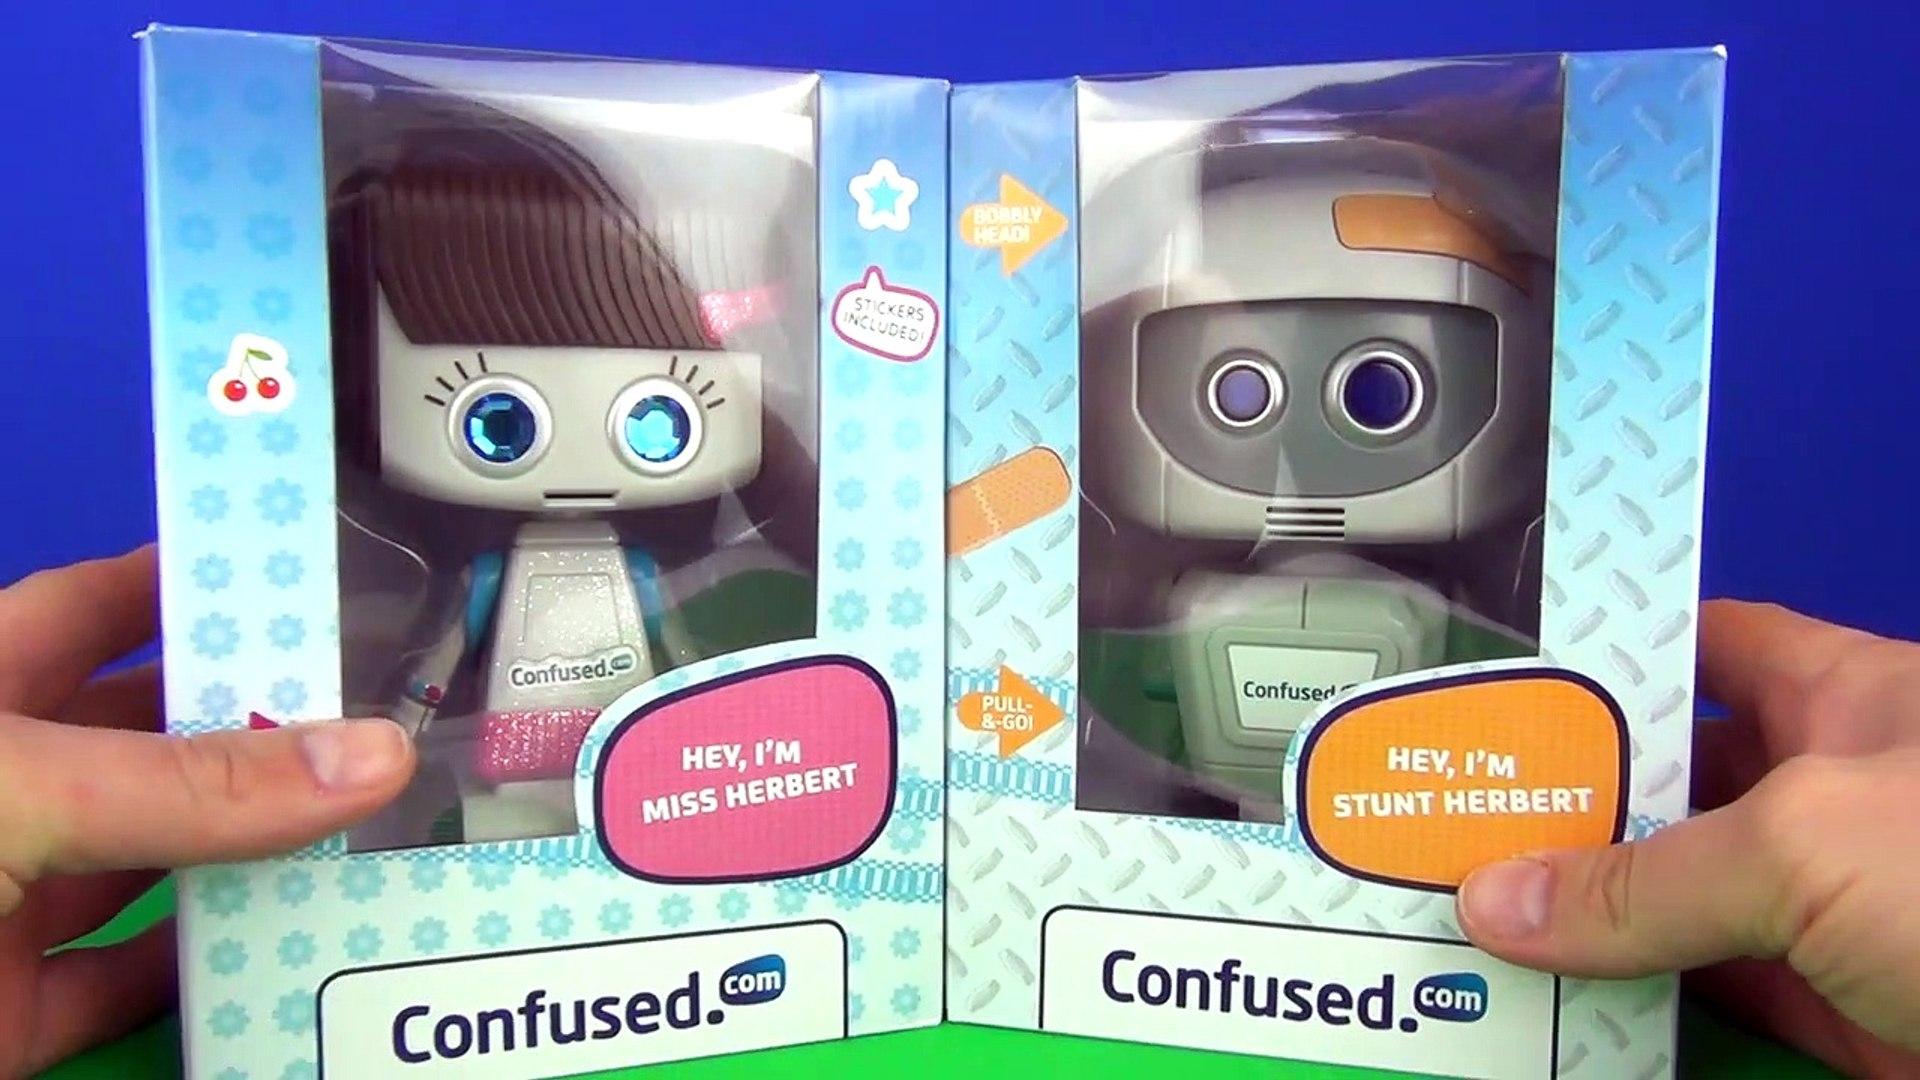 Confused.com Insurance Stunt Herbert & Miss Herbert Robot Toys Unboxing Toy Review TV